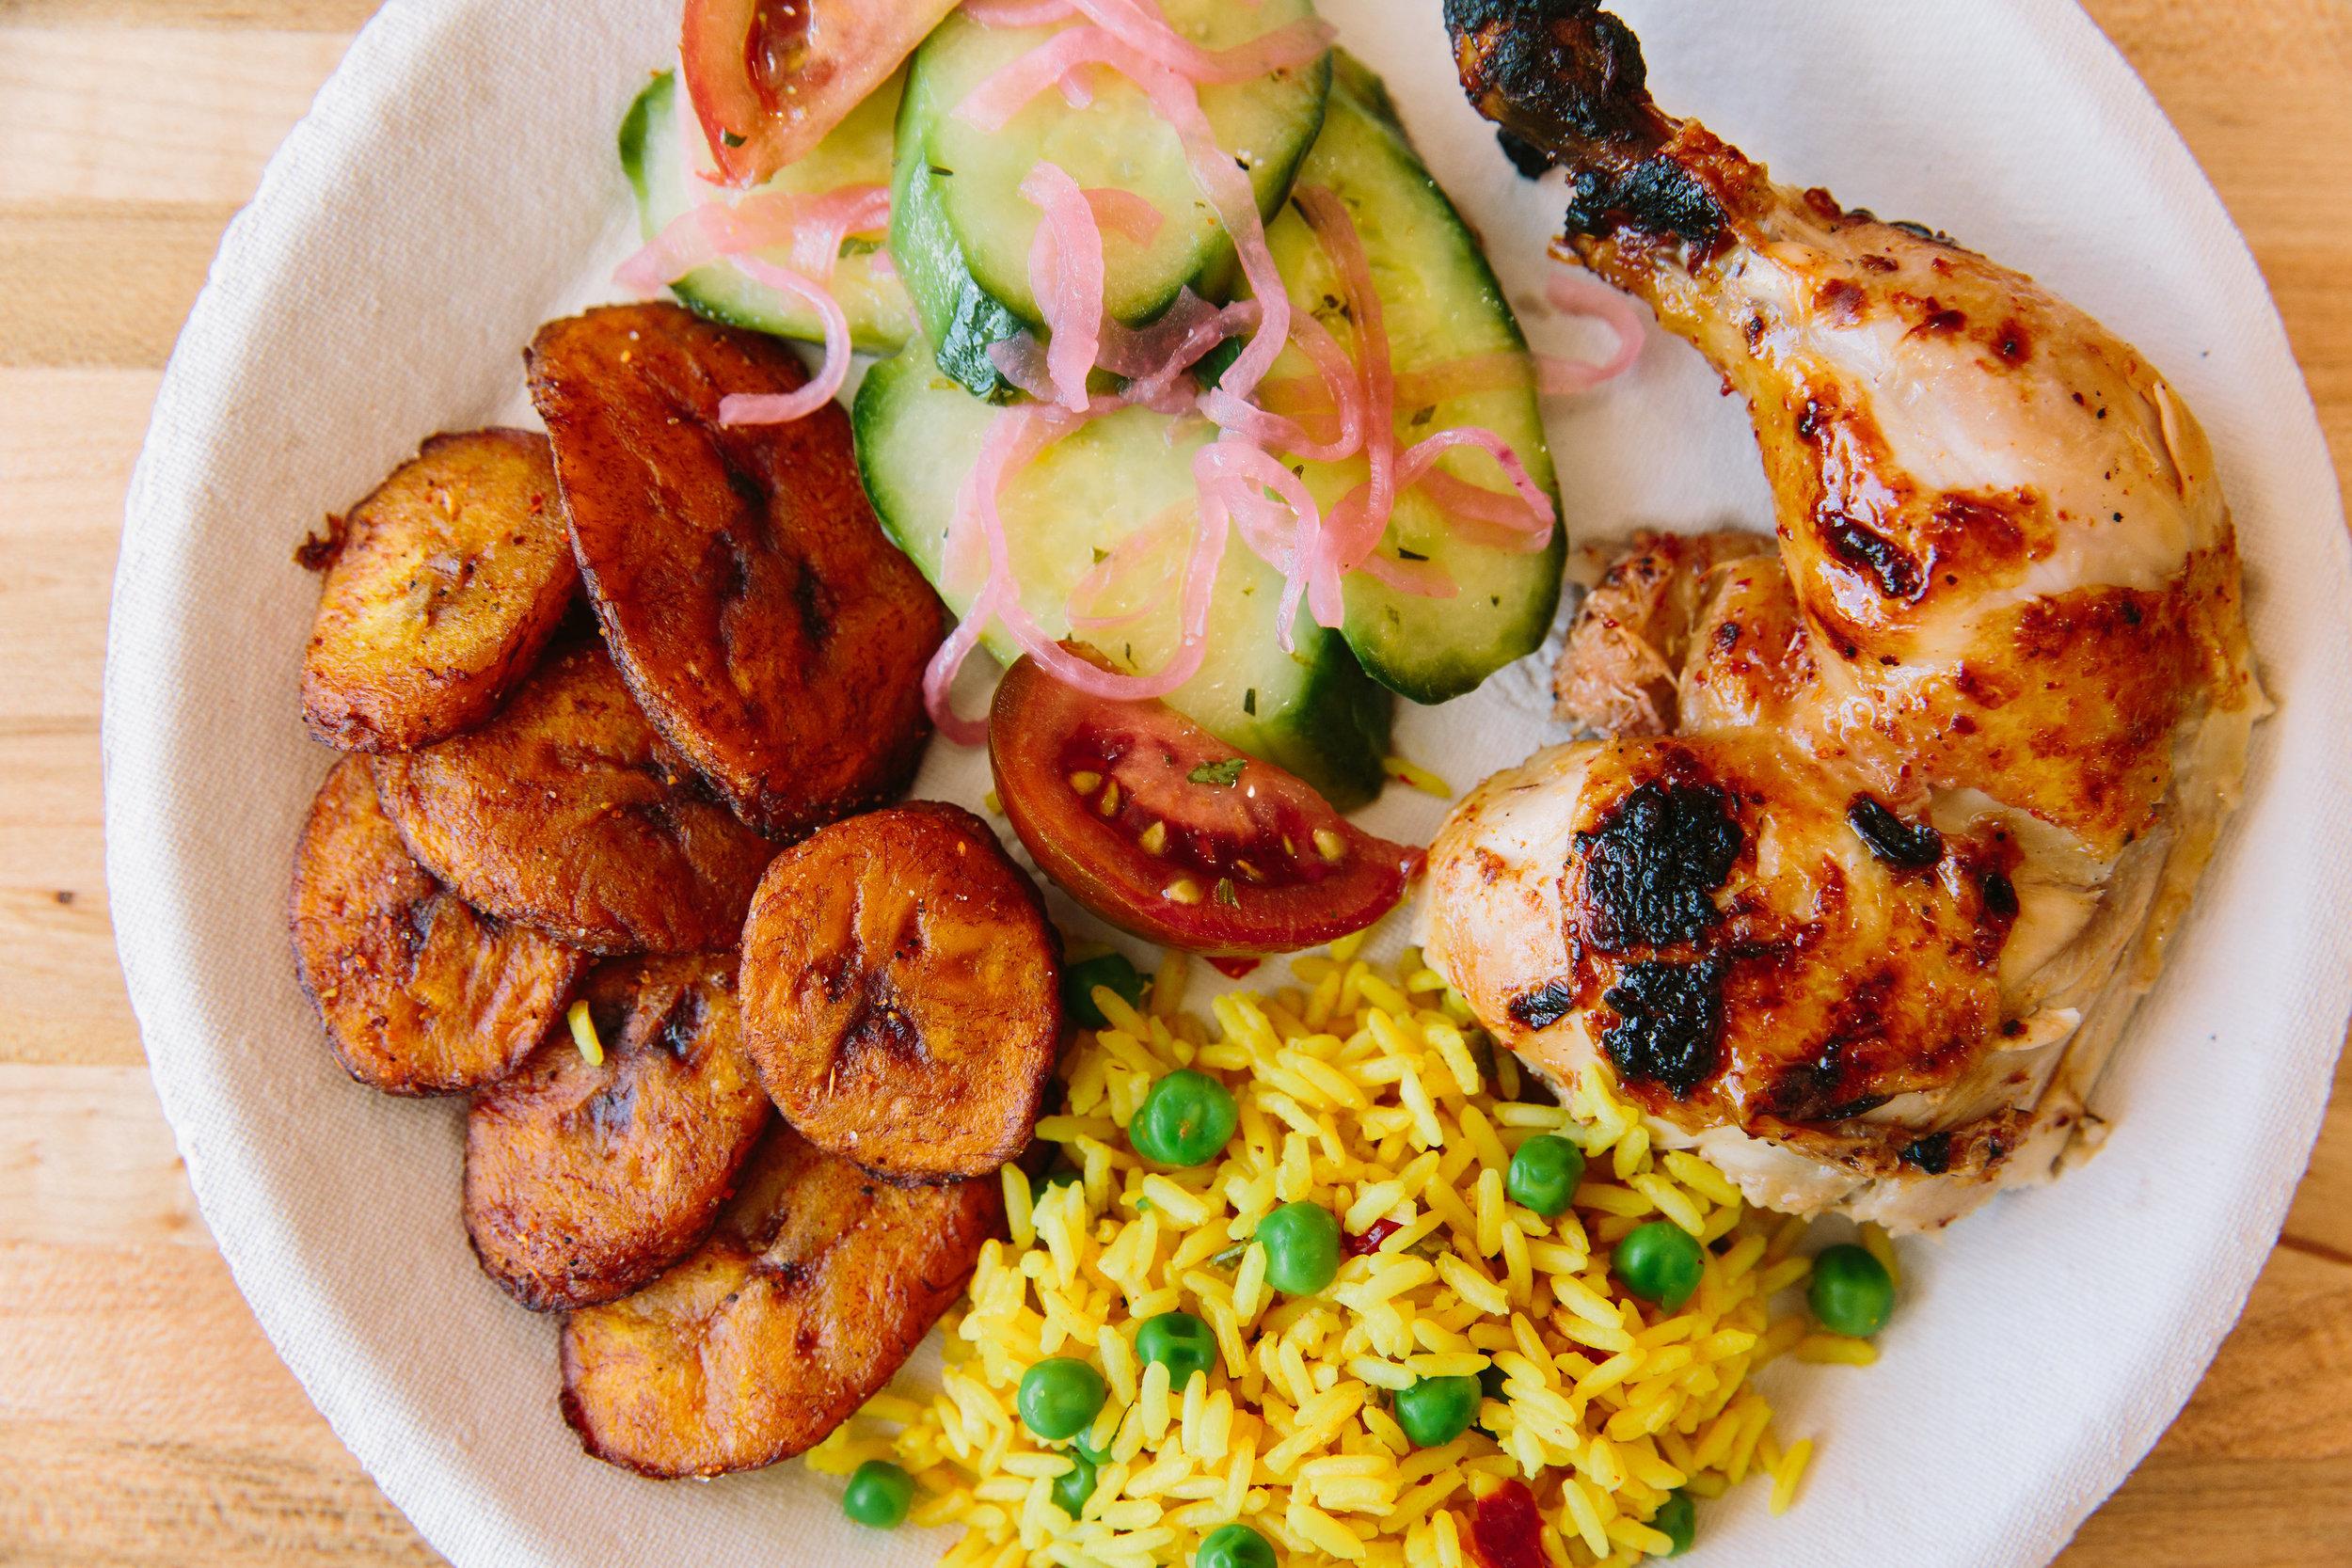 Mercado Food Truck Opens El Pollo Guapo In Wethersfield CT Eats Out